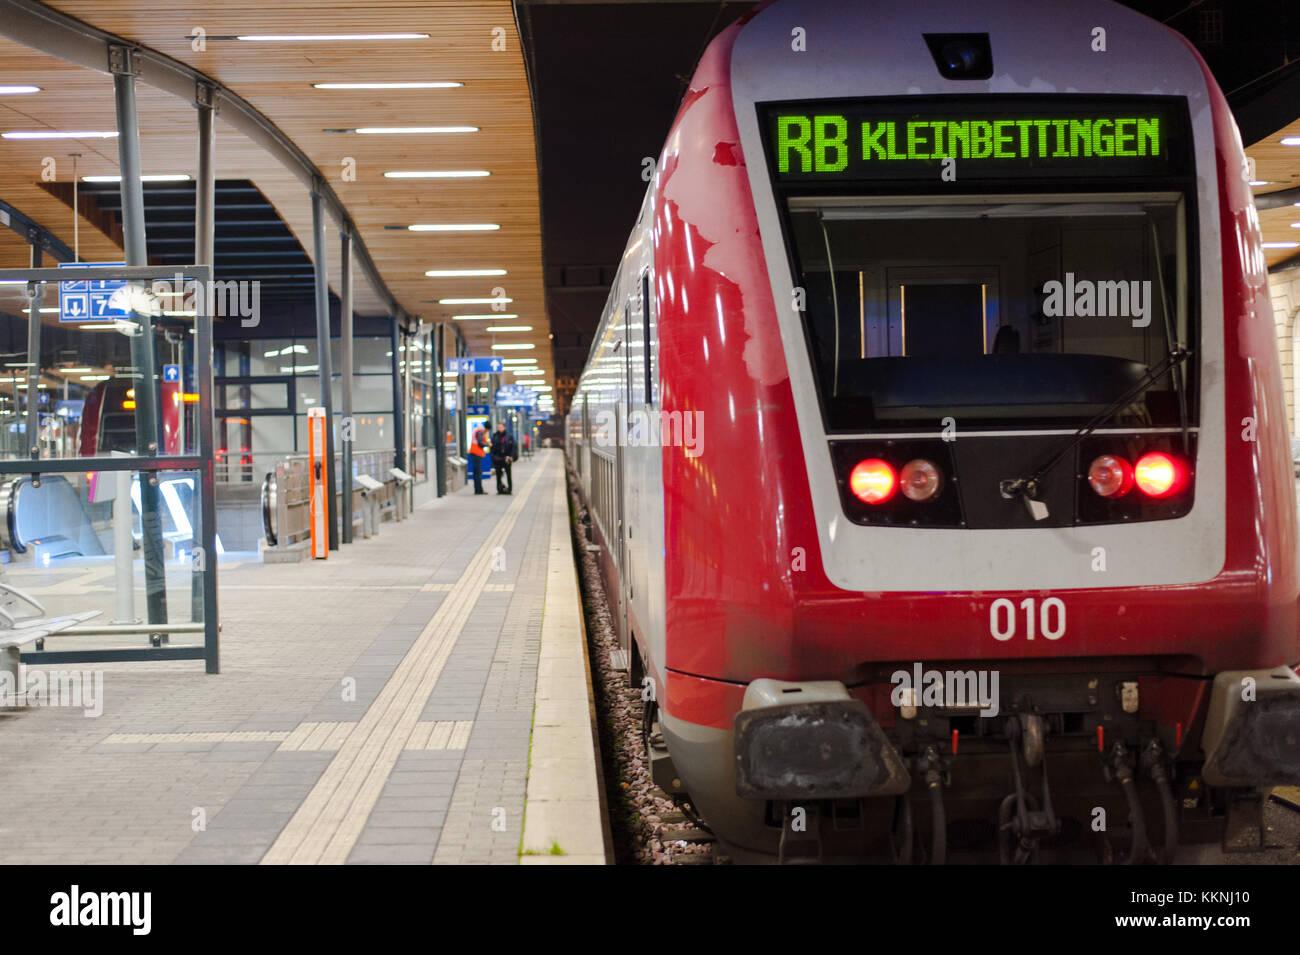 kleinbettingen luxembourg train timetables